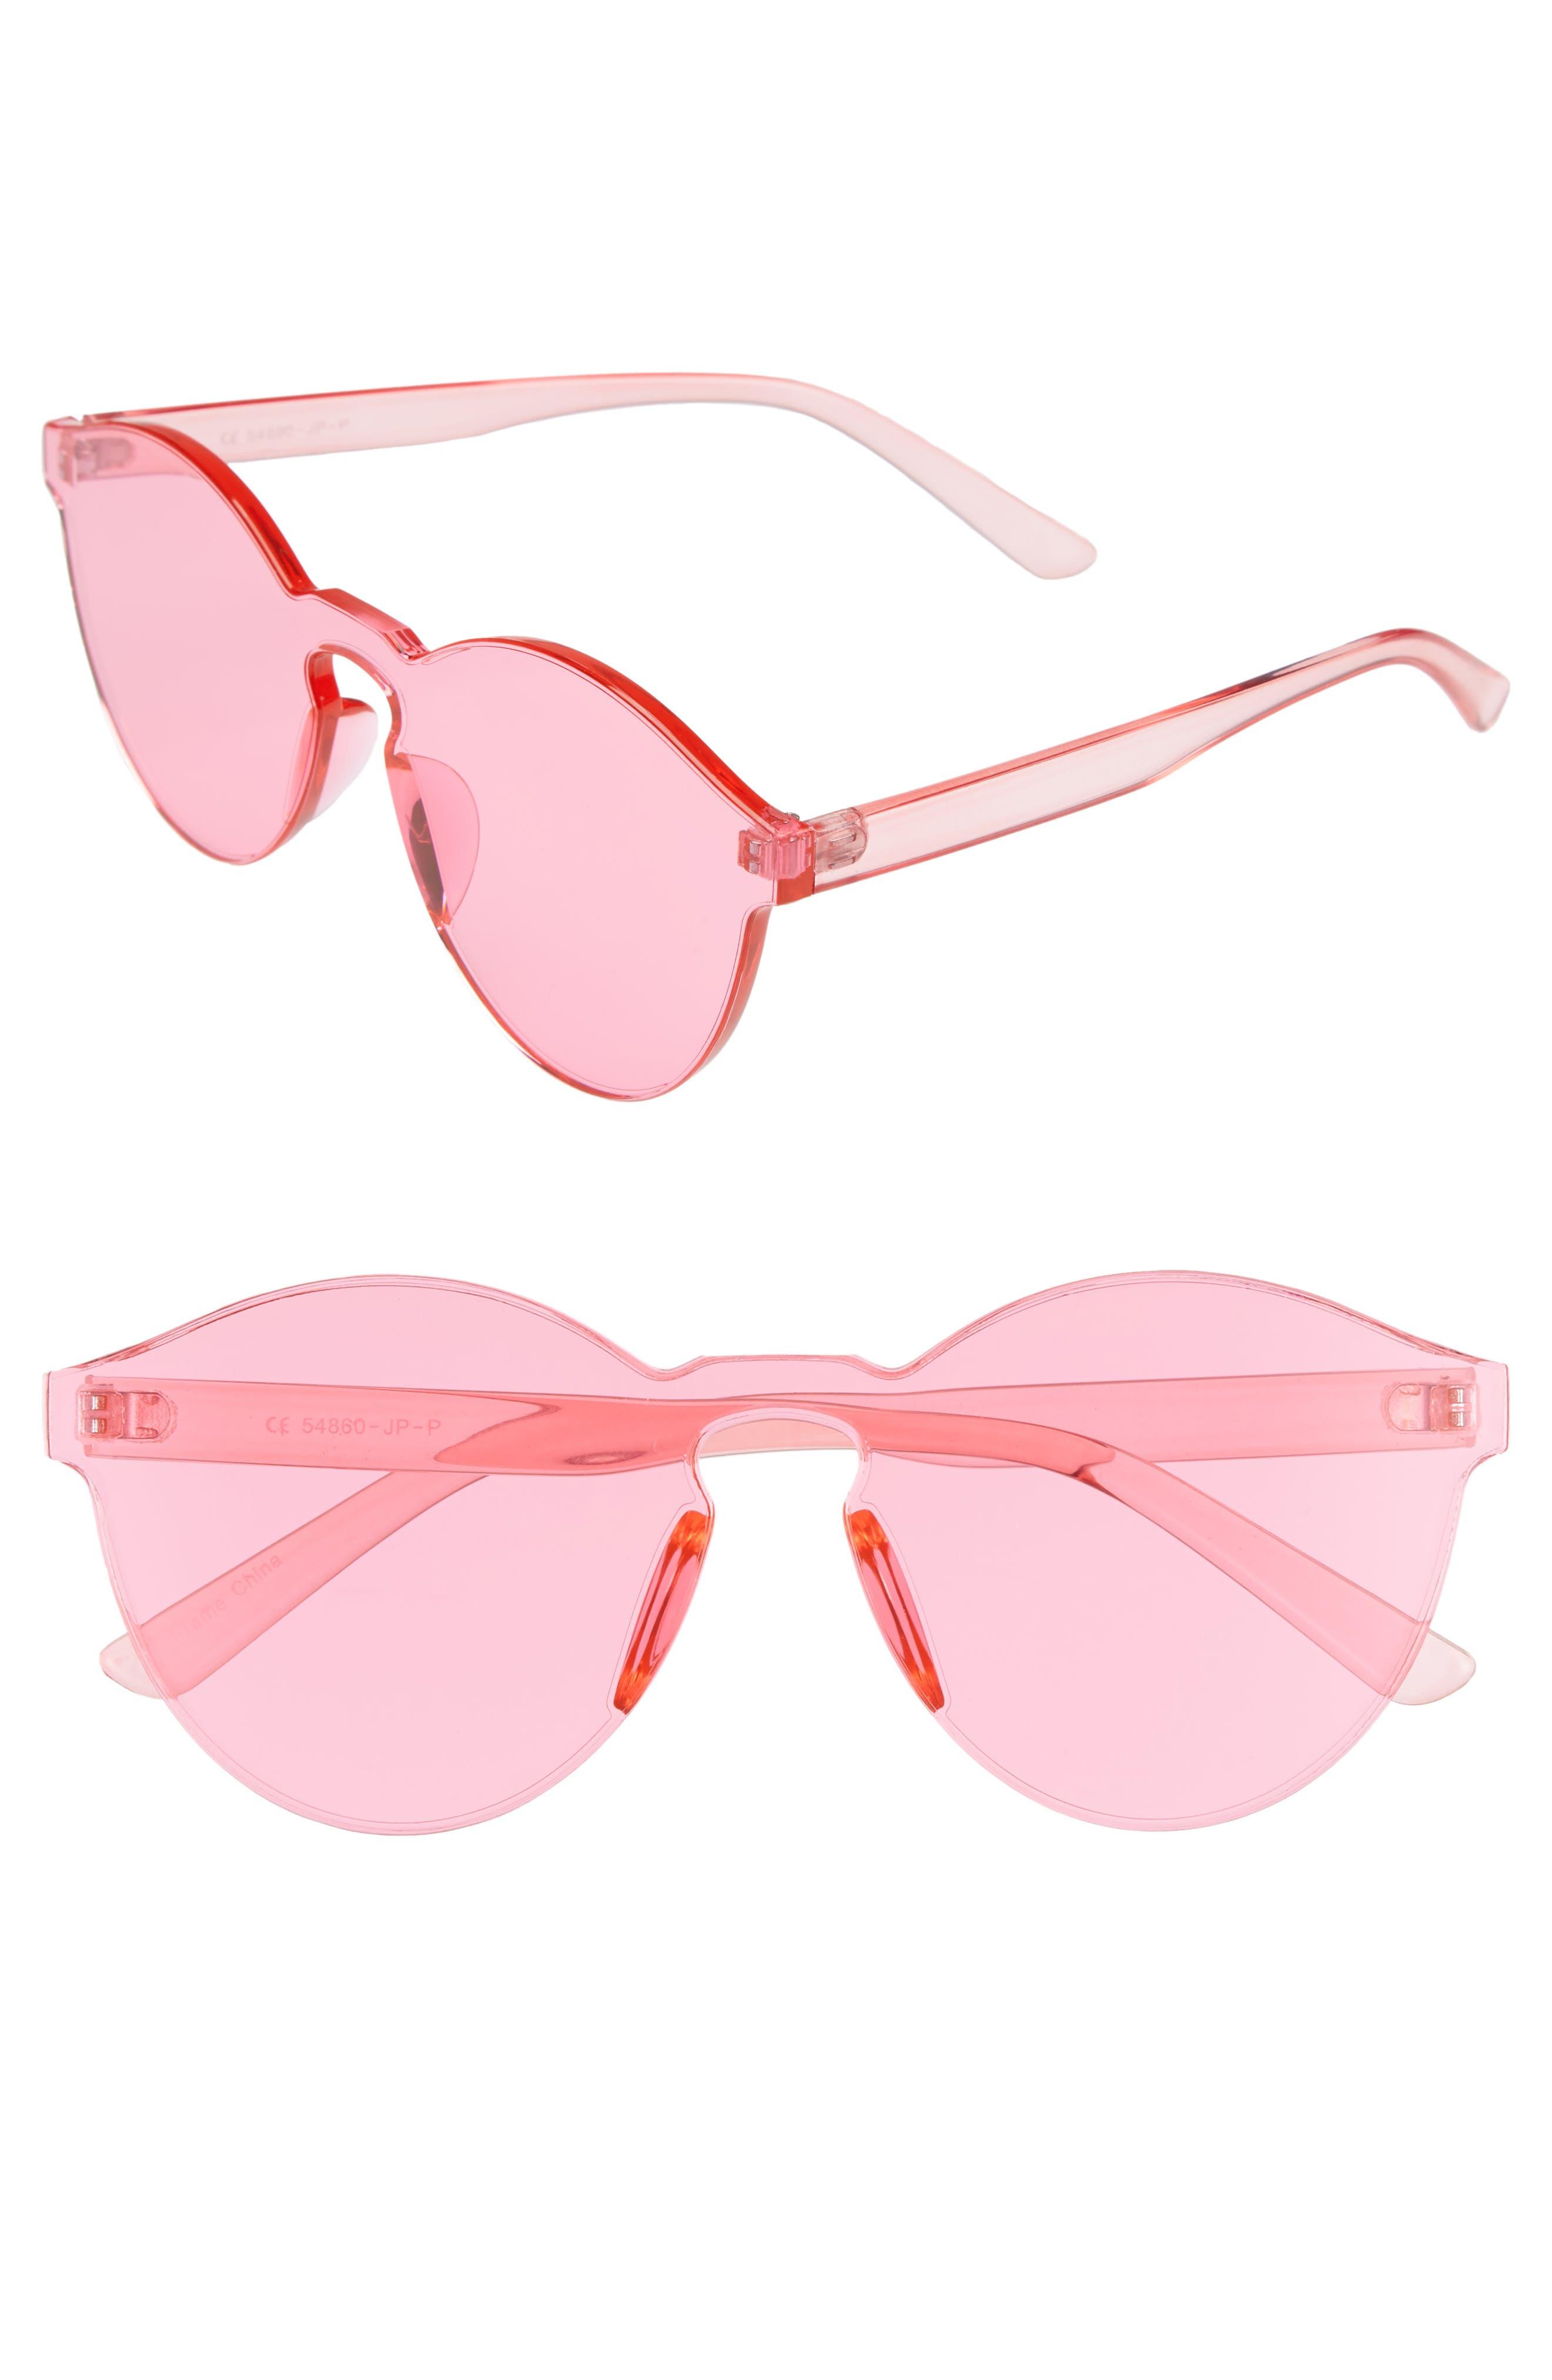 59mm Rimless Round Sunglasses,                         Main,                         color, 650